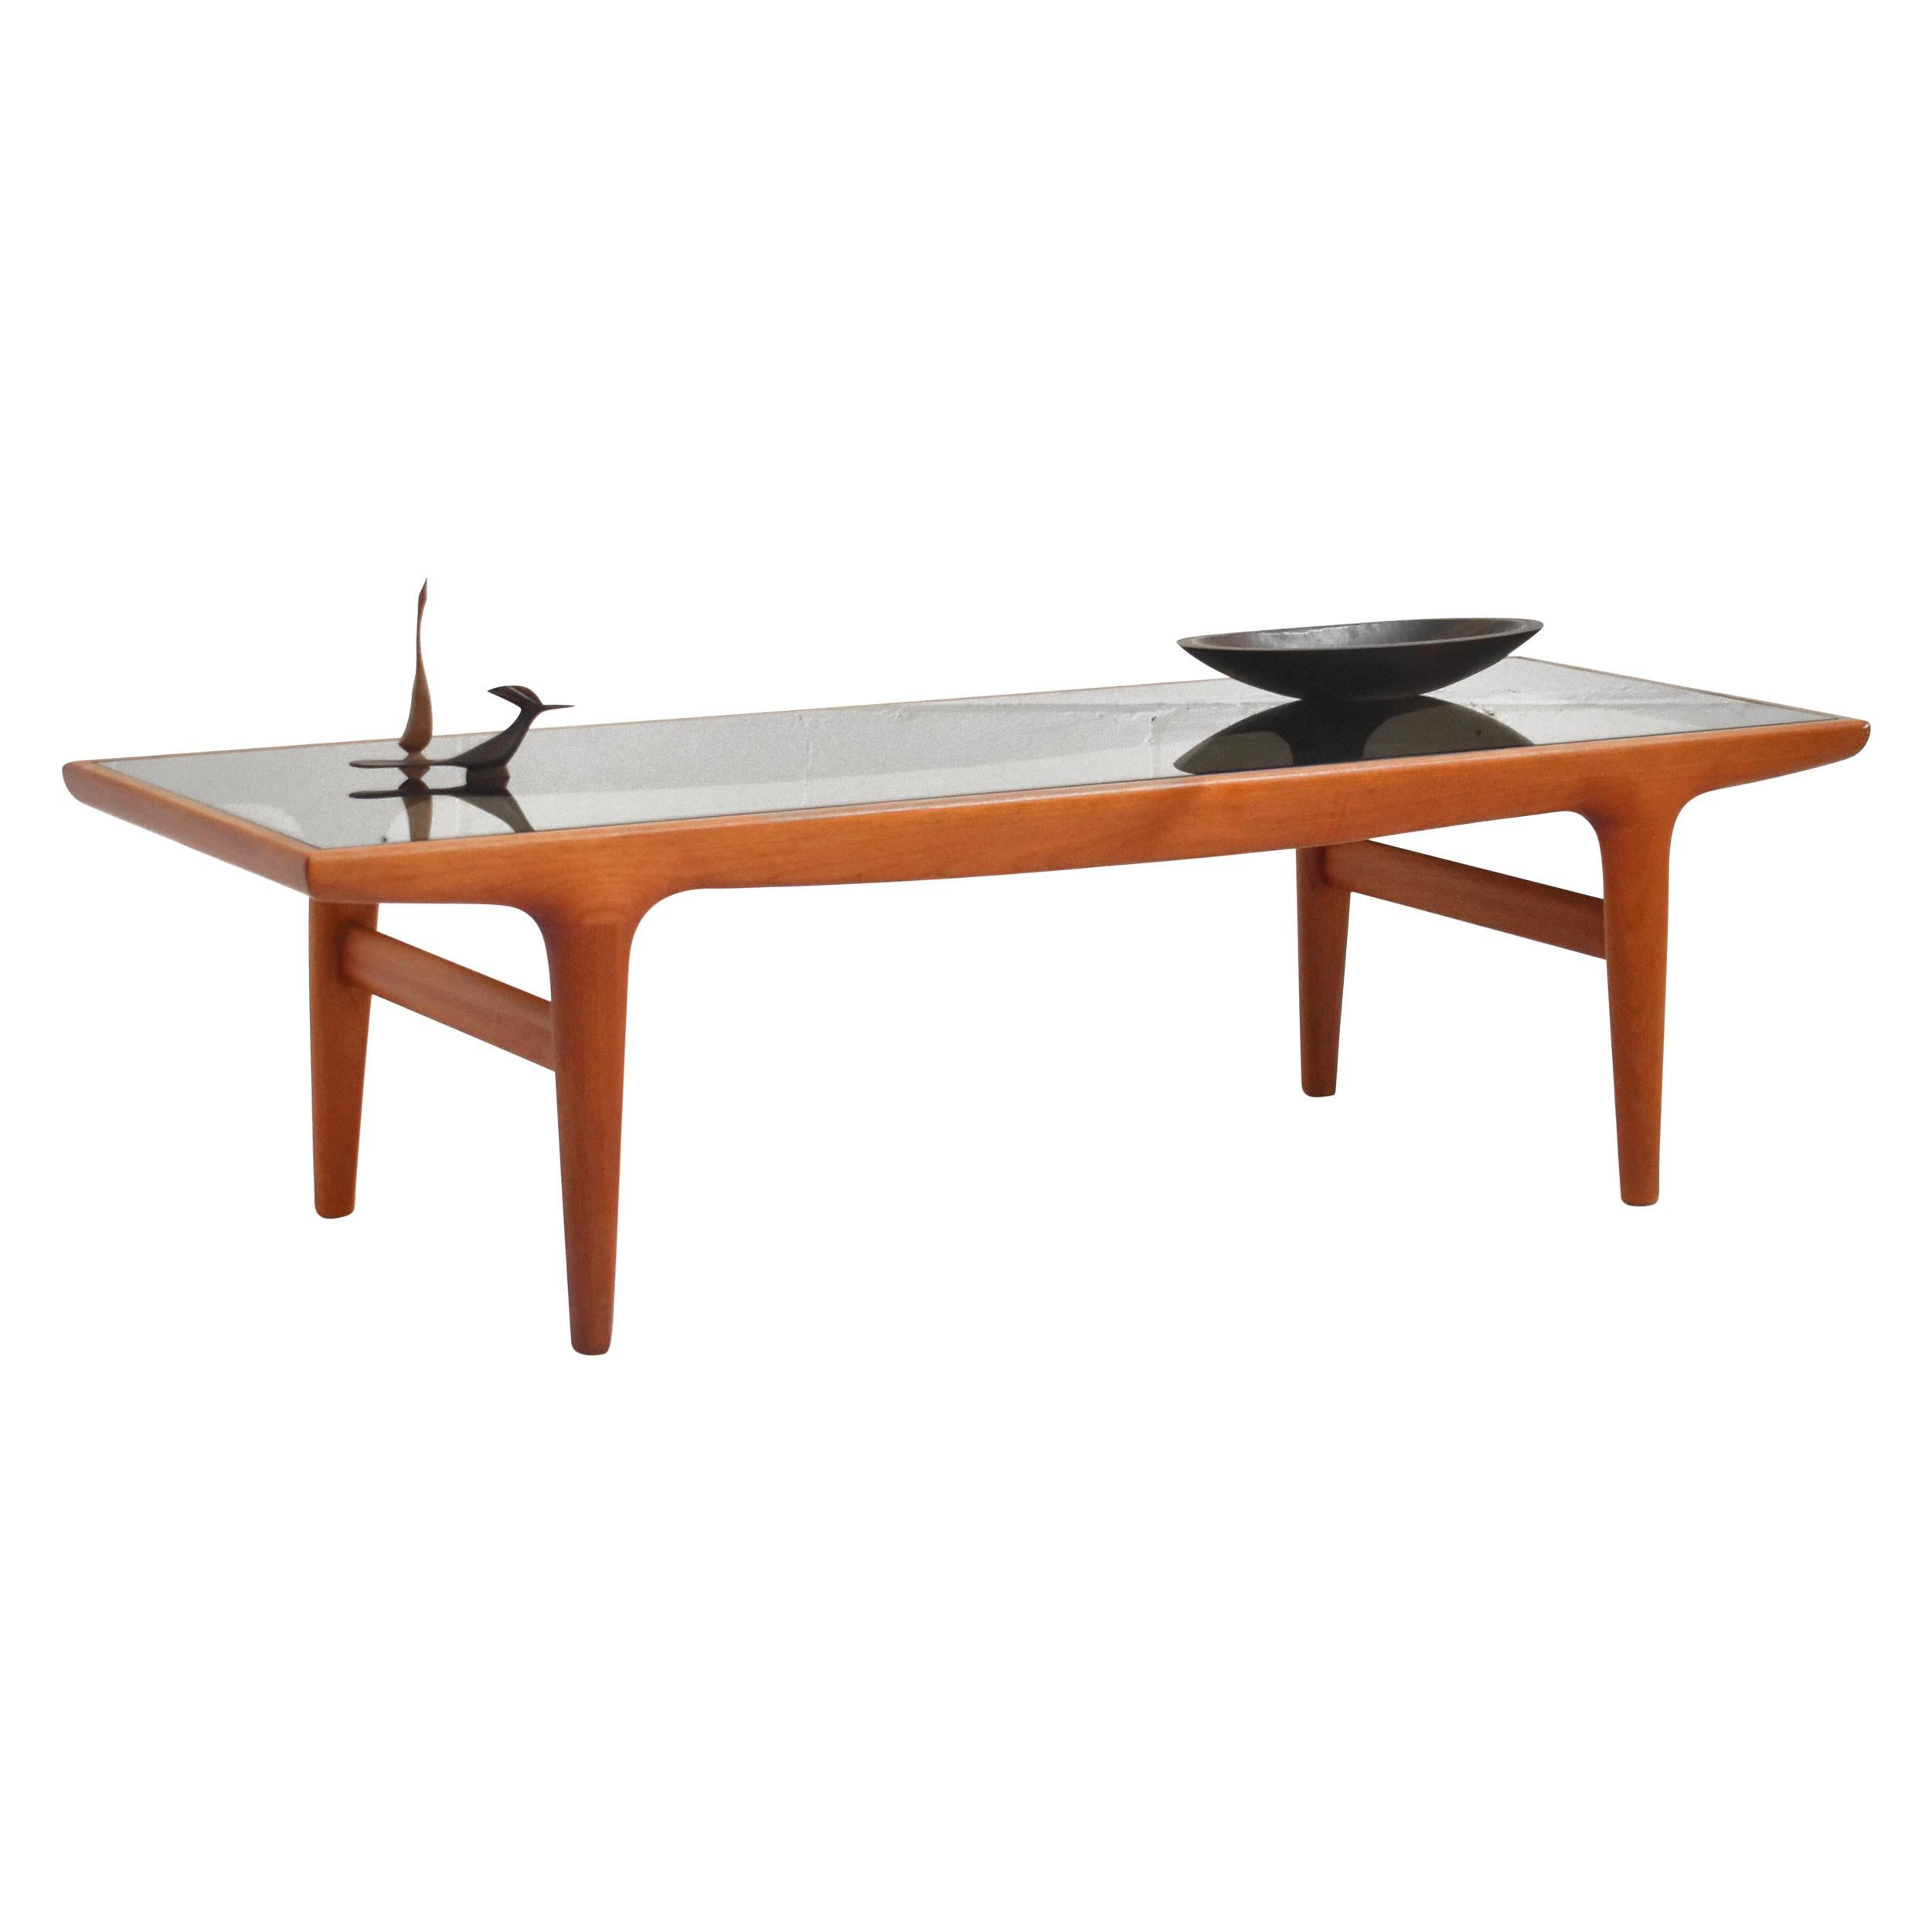 Danish Teak Coffee Table by Johannes Andersen for Uldum Møbelfabrik